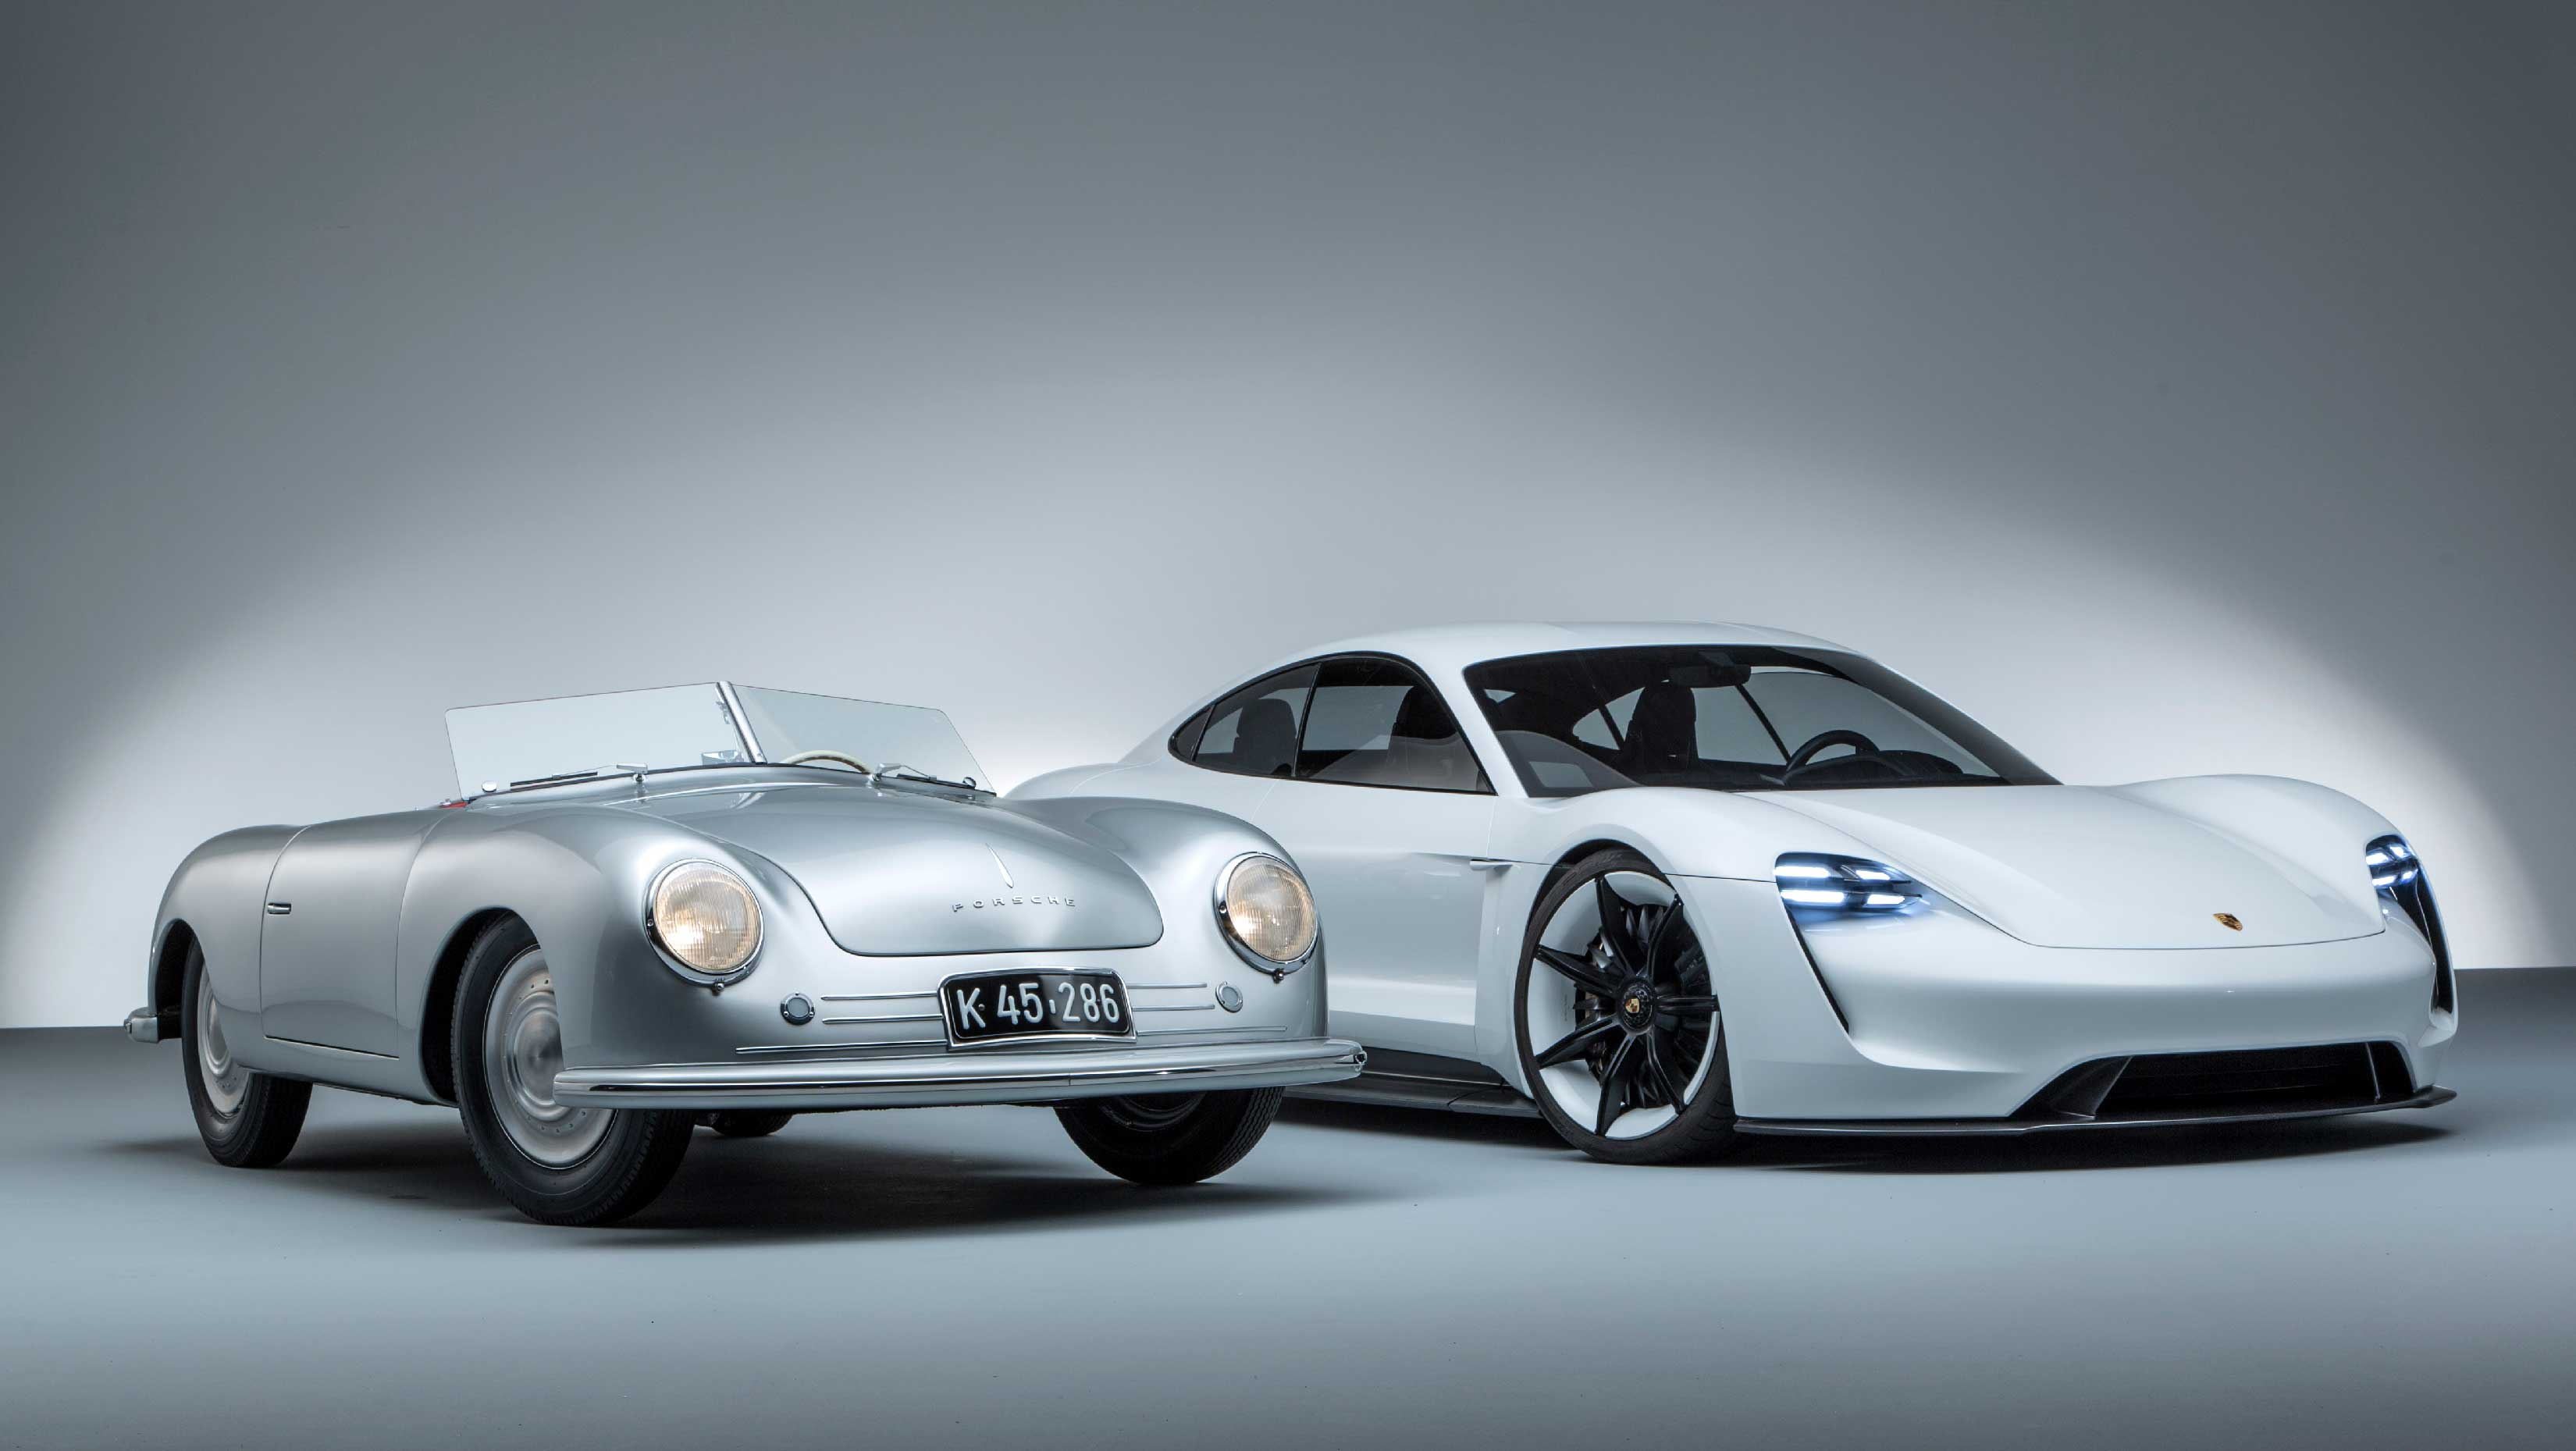 70 años de Porsche: del 356 Roadster al Mission E